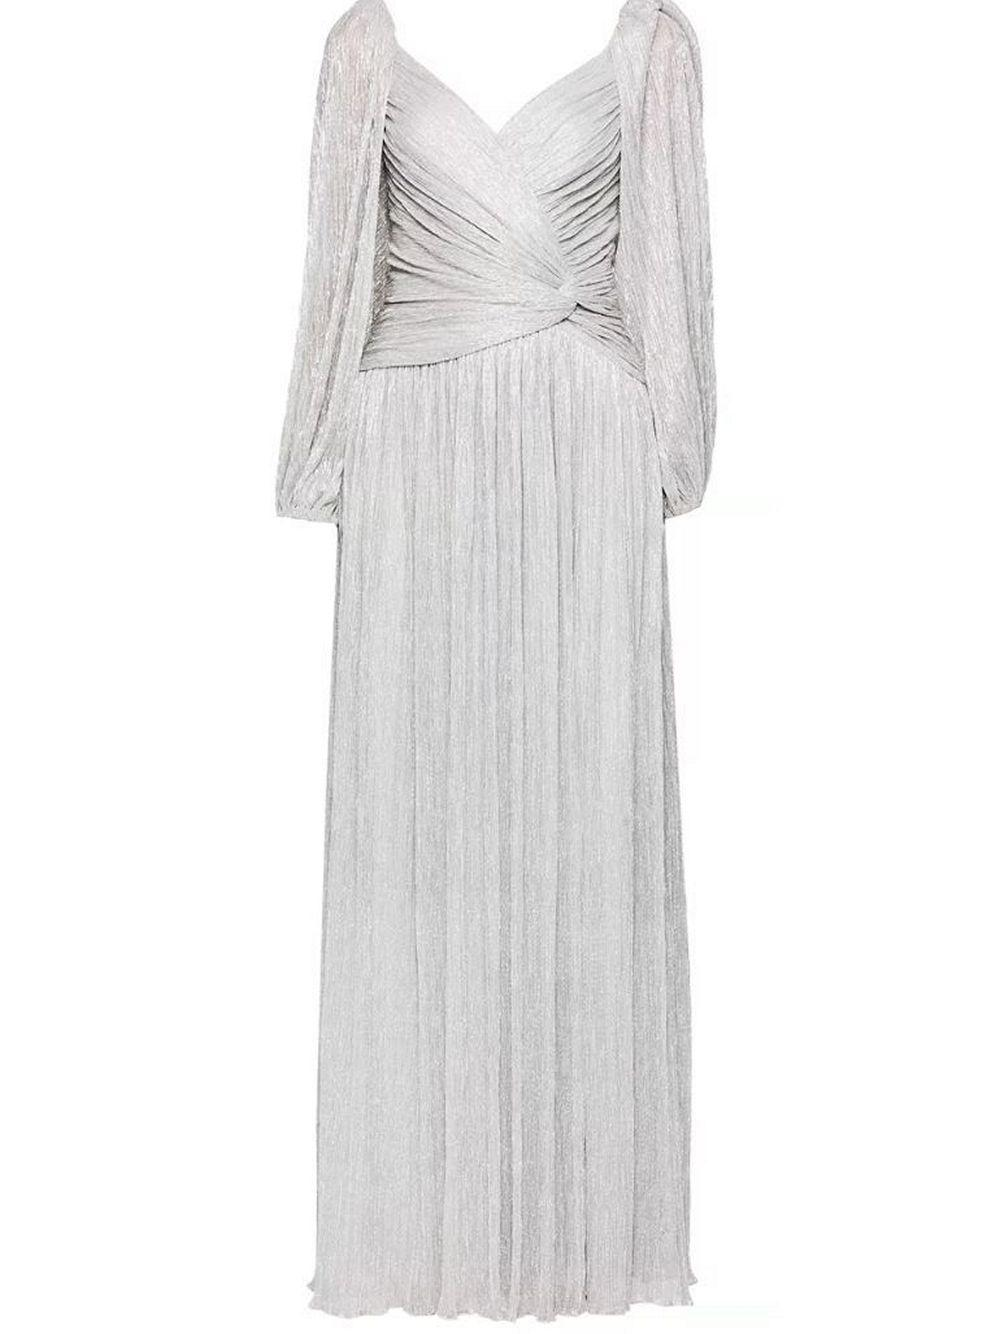 Adele Plisse Lame Wrap Gown Item # 320-1016-M